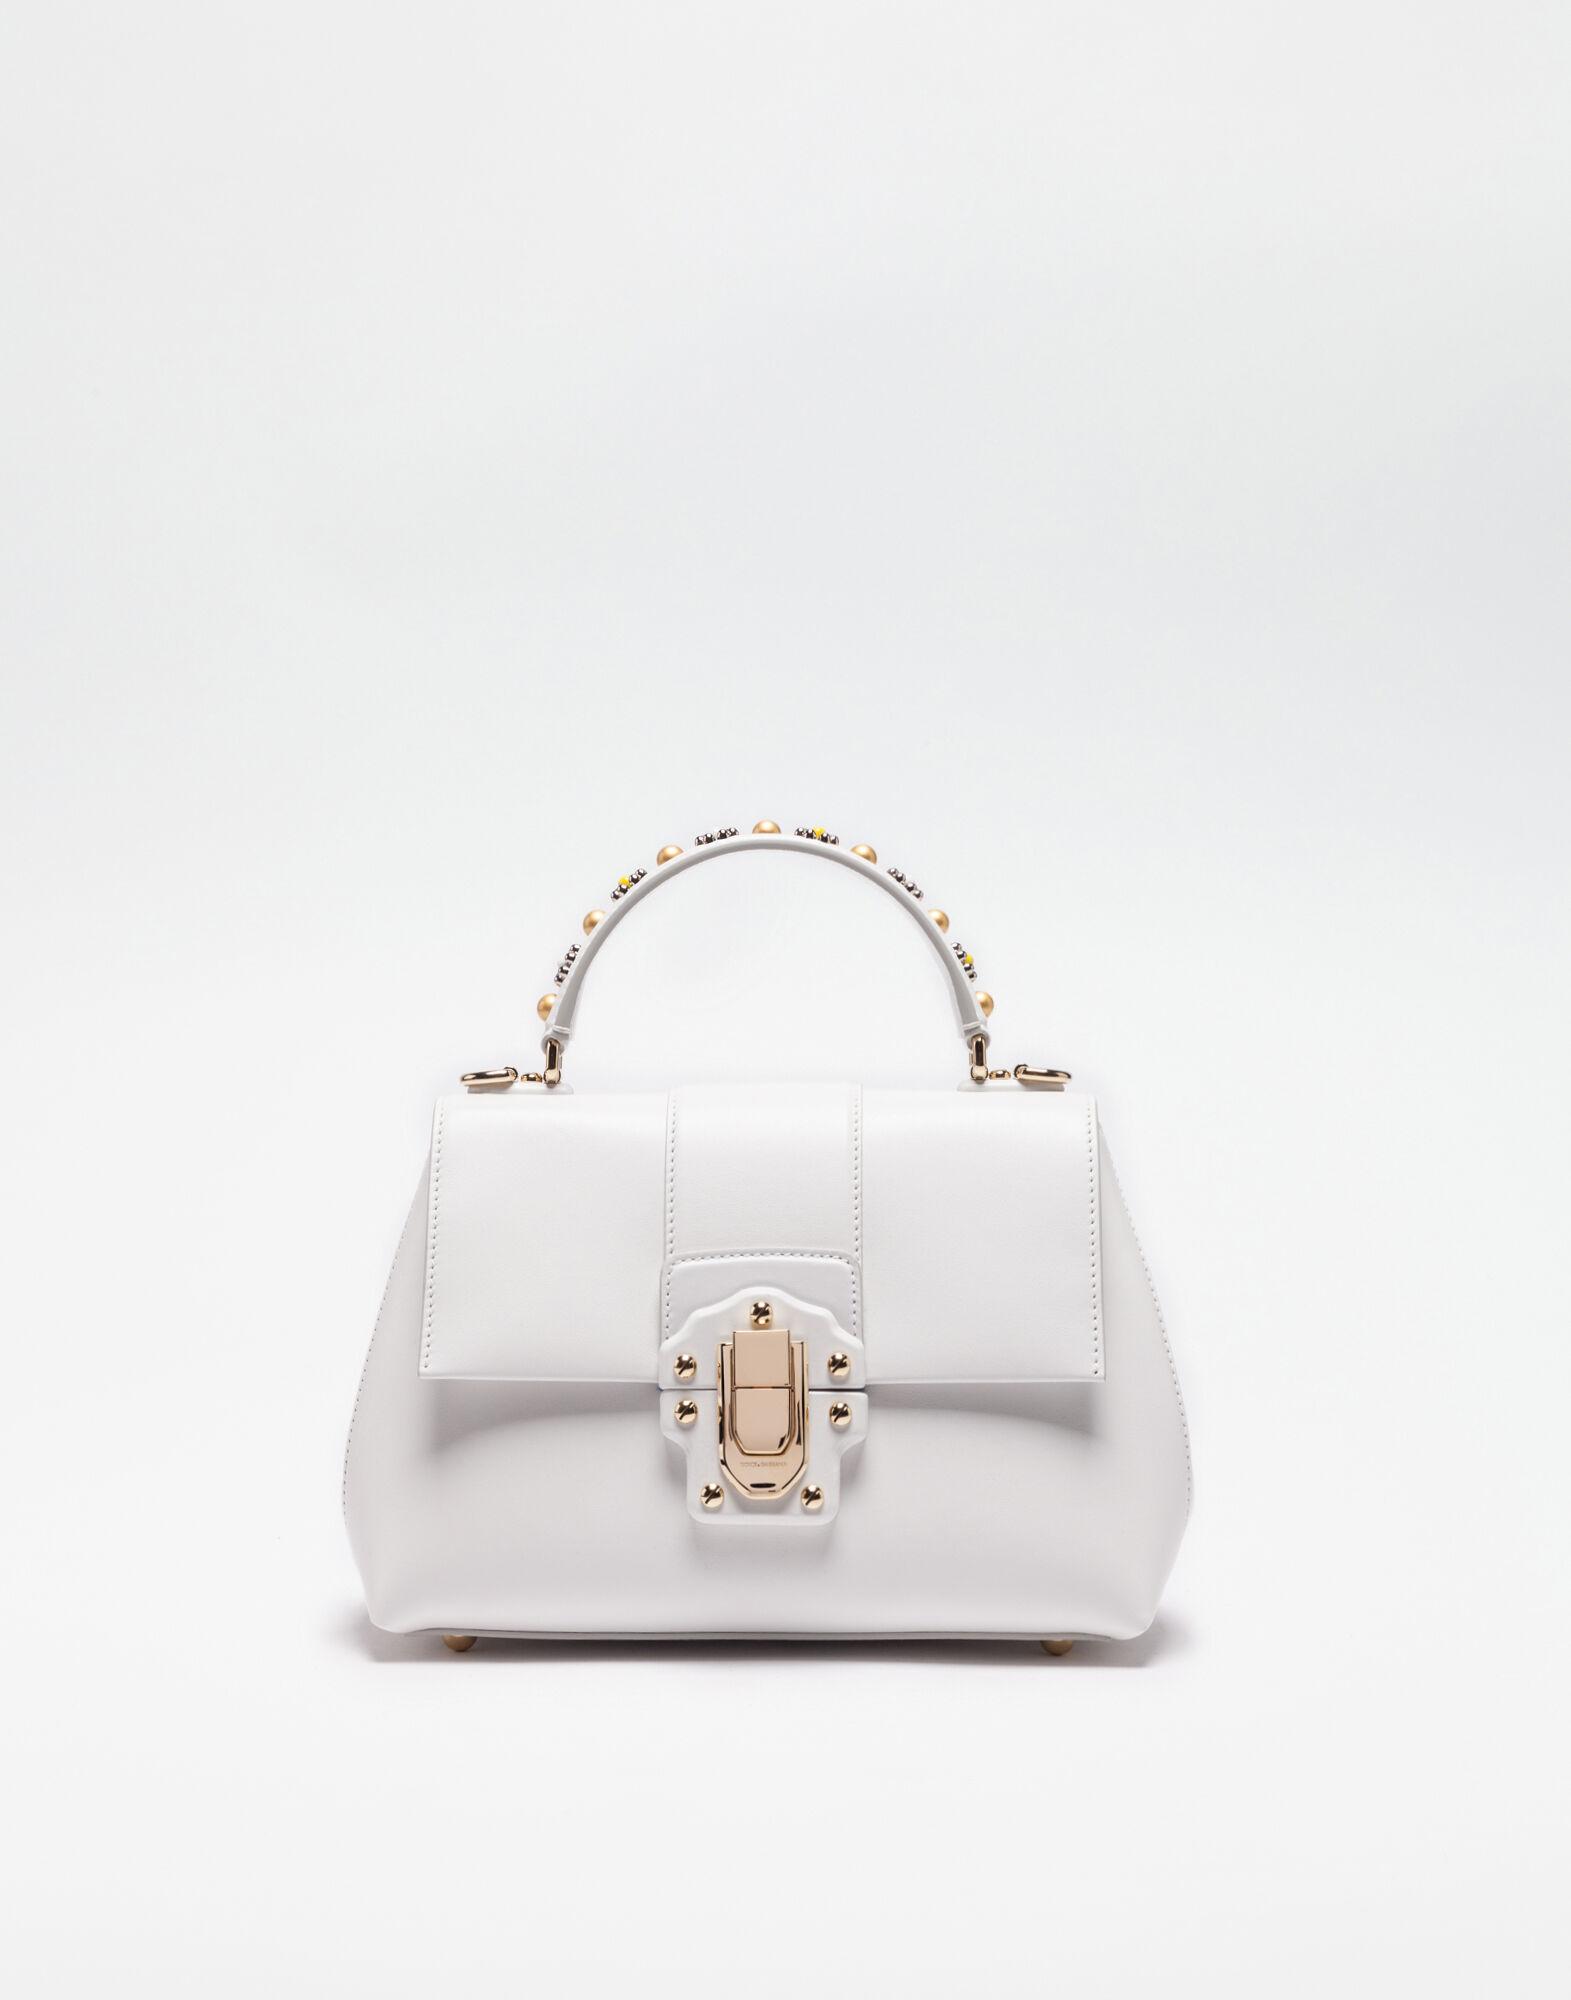 Women's handbags, new collection   Dolce&Gabbana - SMALL LUCIA BAG ...